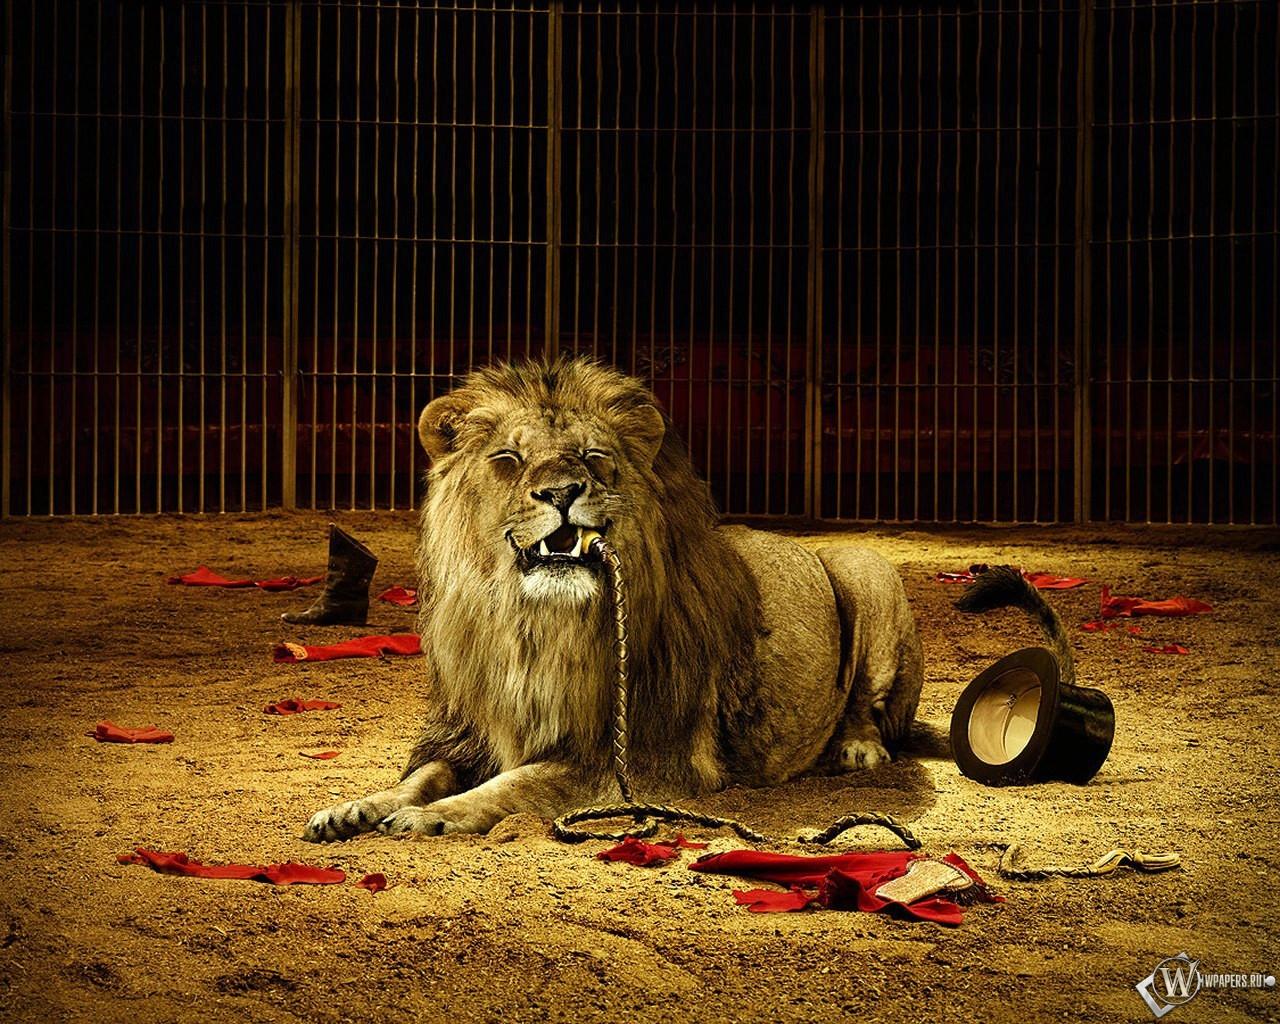 Лев с плеткой 1280x1024